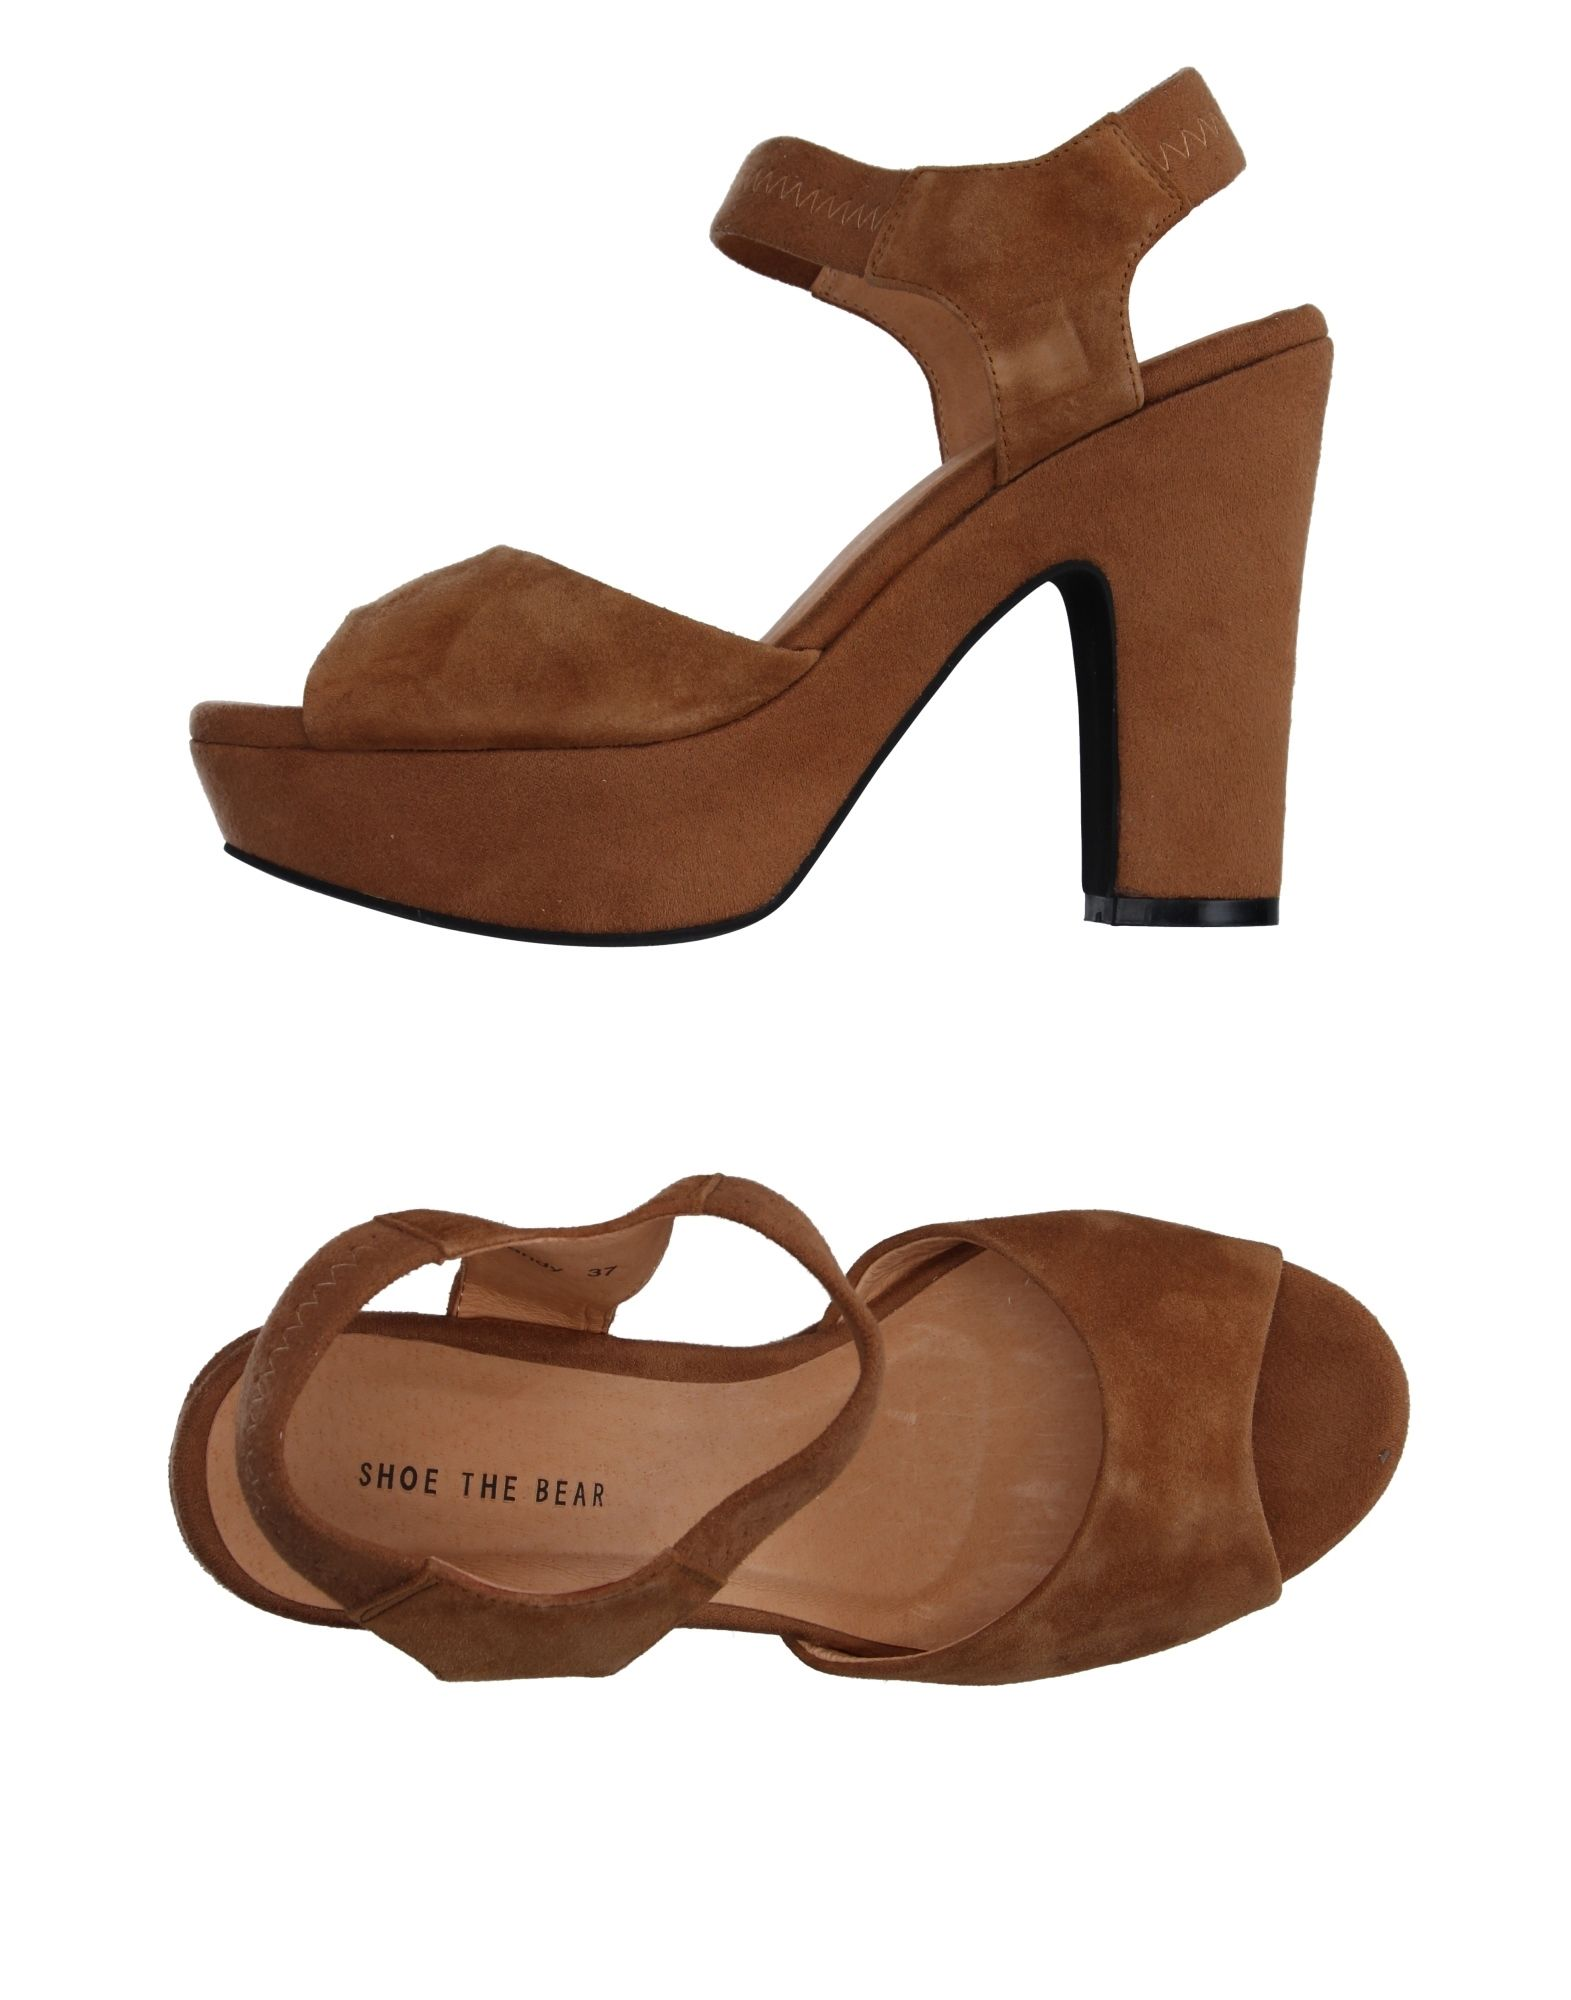 Shoe The Bear Sandals